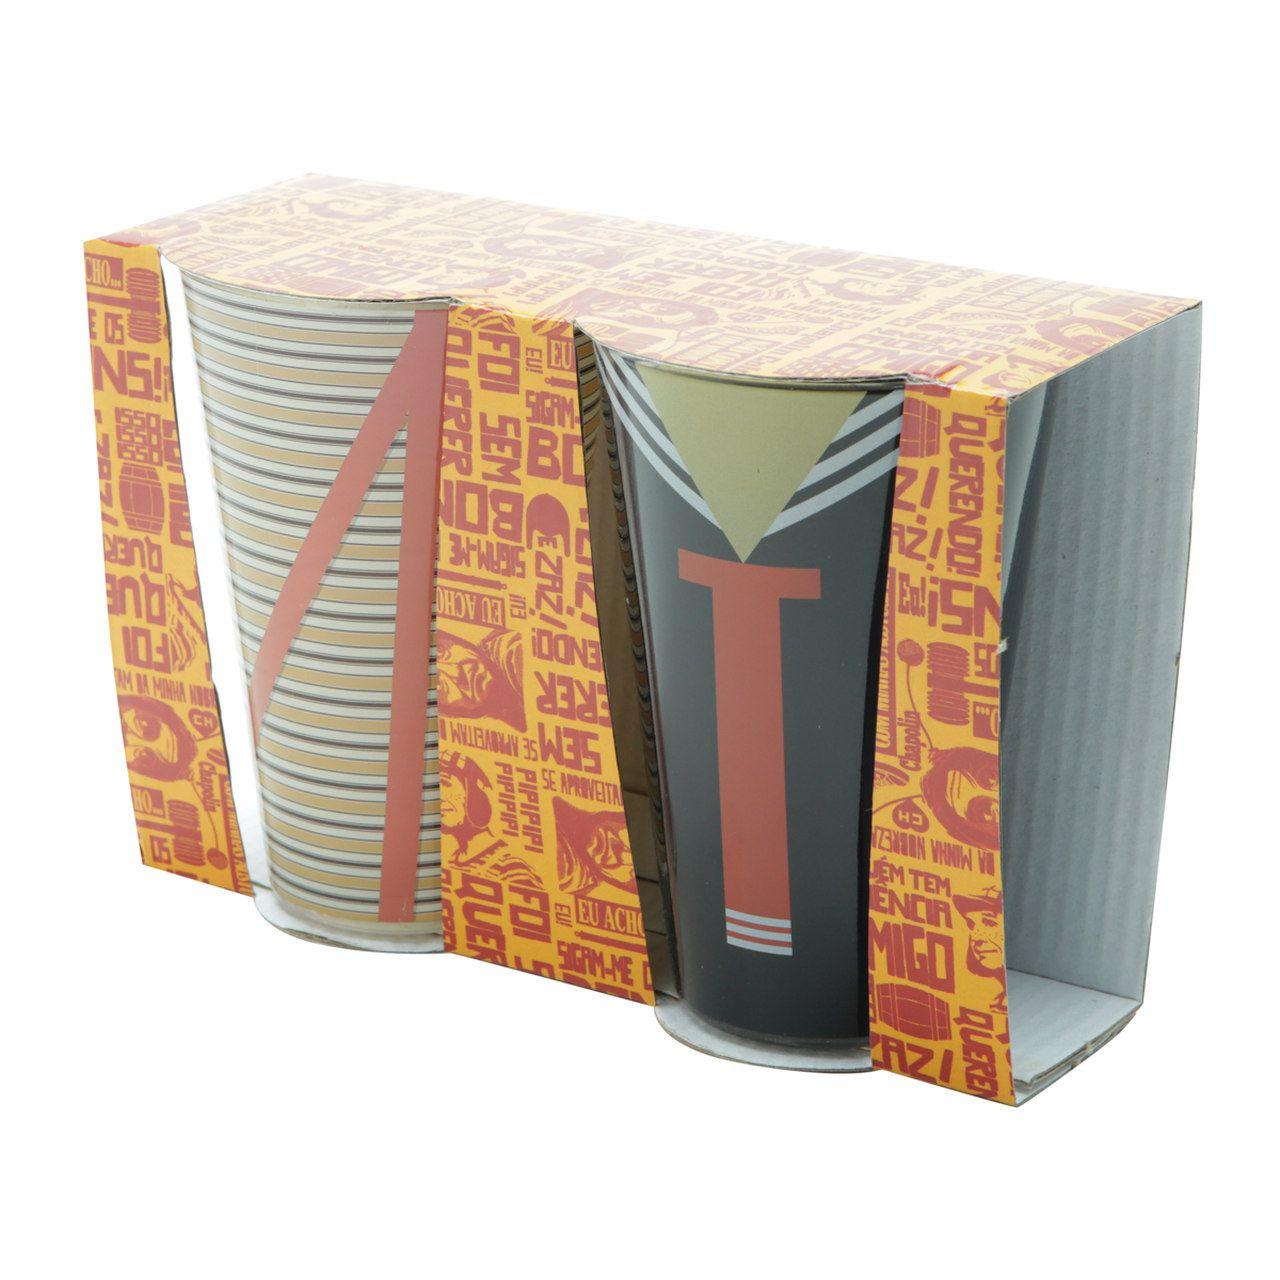 Set 2 Copos de Vidro Chaves (300ml) - Urban